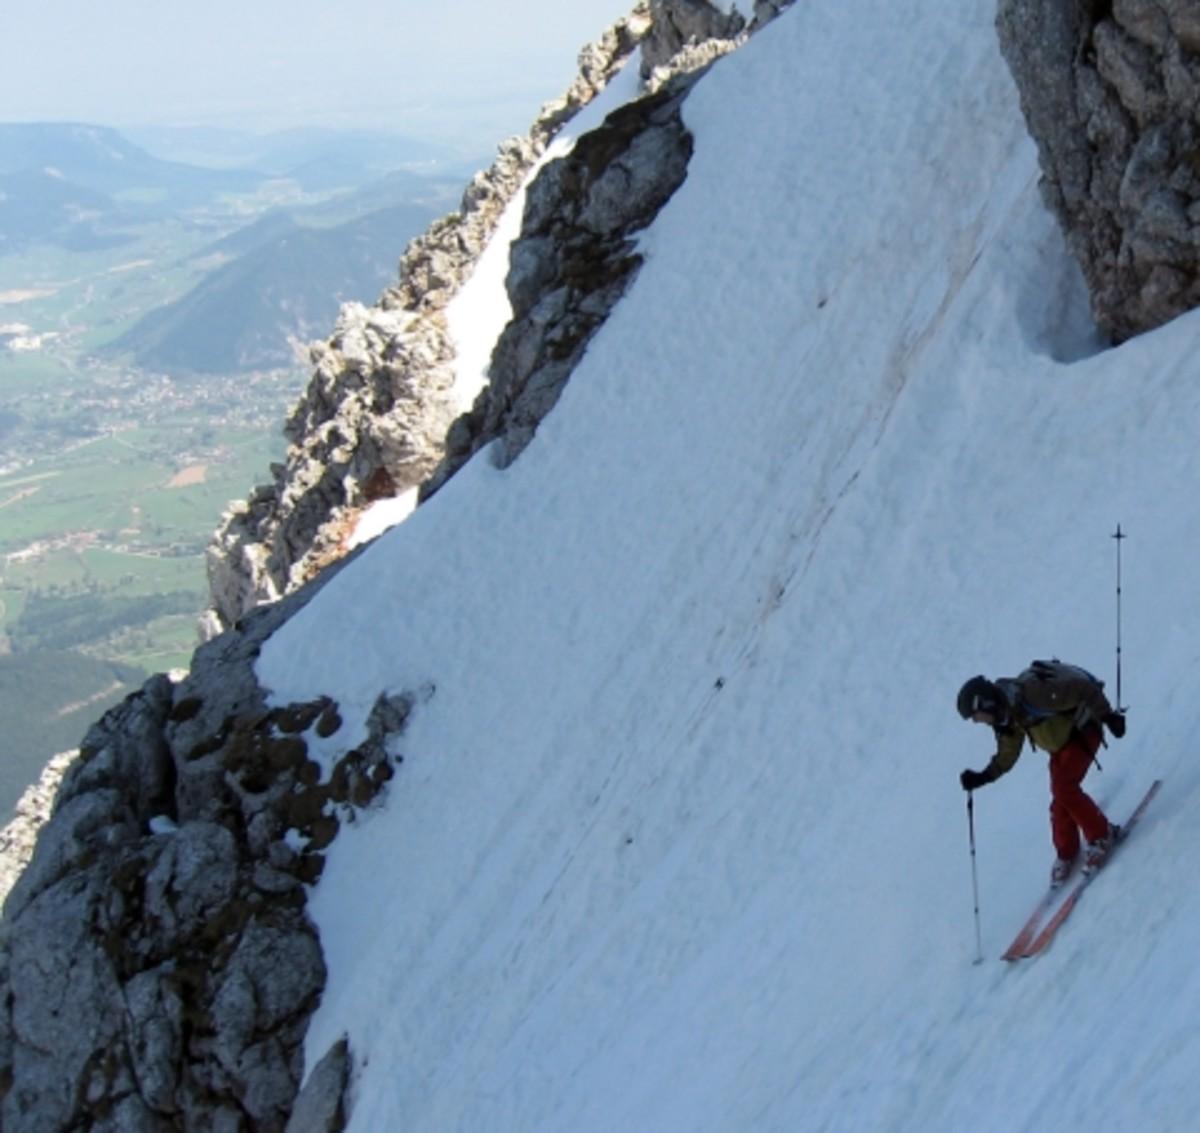 Skiing the Narrndattl Couloir at the Schneeberg massif near Vienna.